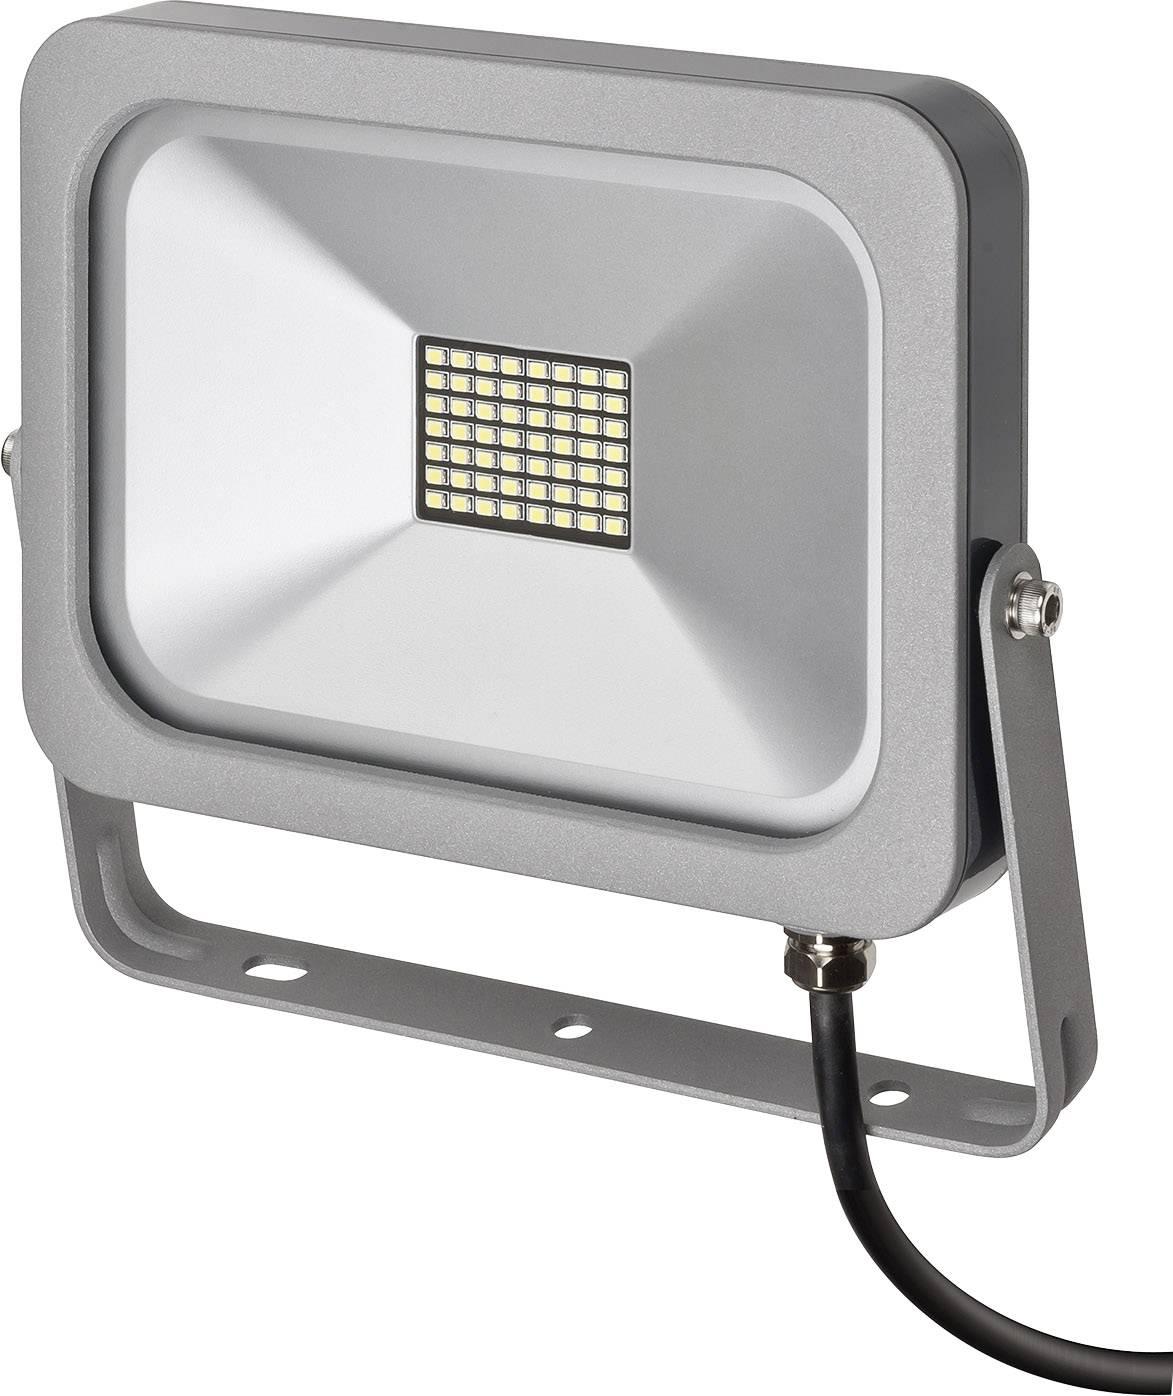 BrennenstuhlBouwplaatsen verlichting 1172900300 Zilver | Conrad.nl